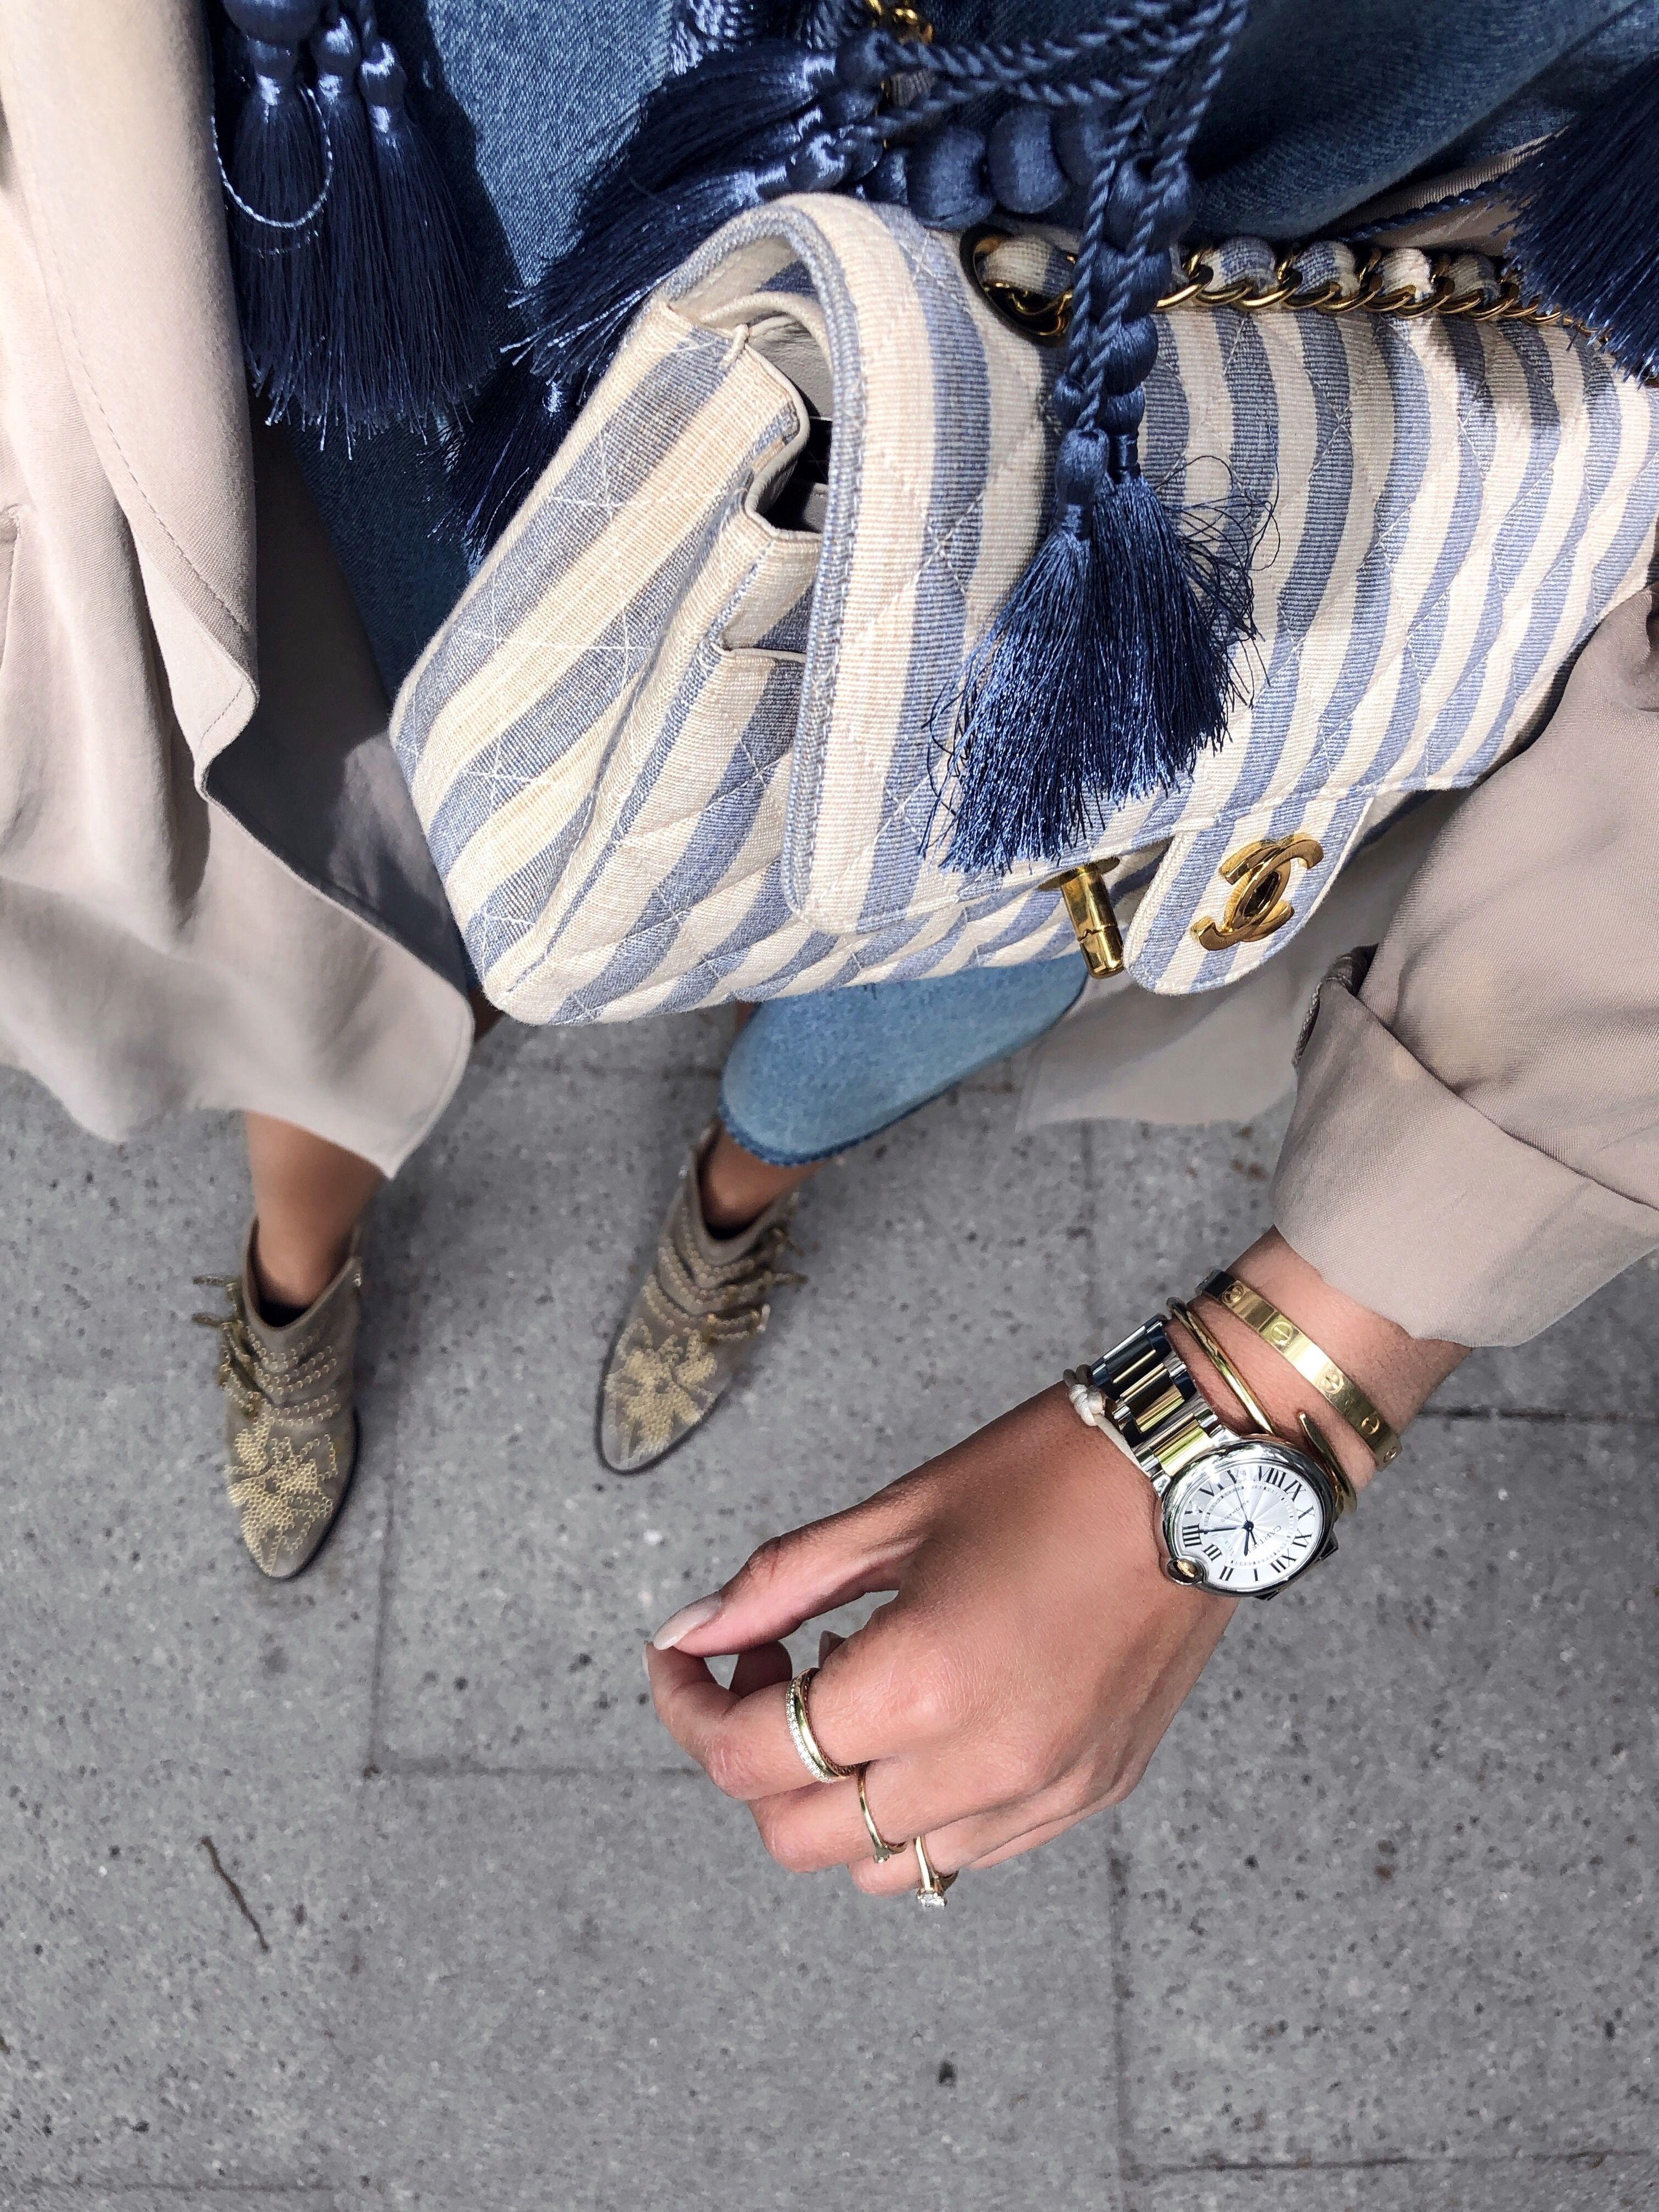 4630e3d194 Aylin Koenig   Chanel Vintage bag   Chloé susanna boots   Aylin ...